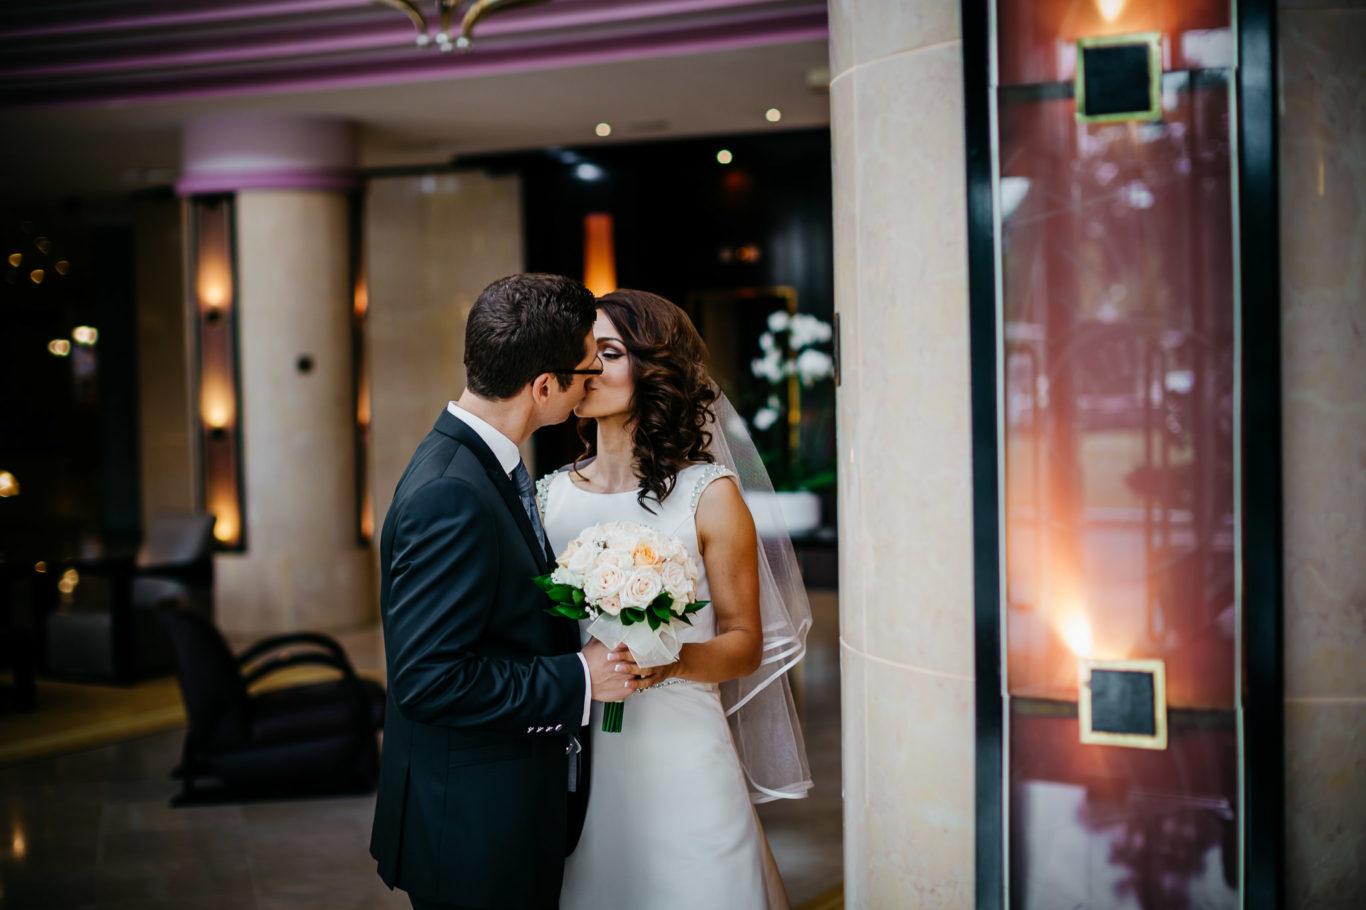 0292-fotografie-nunta-bucuresti-dana-radu-fotograf-ciprian-dumitrescu-cd2_6934